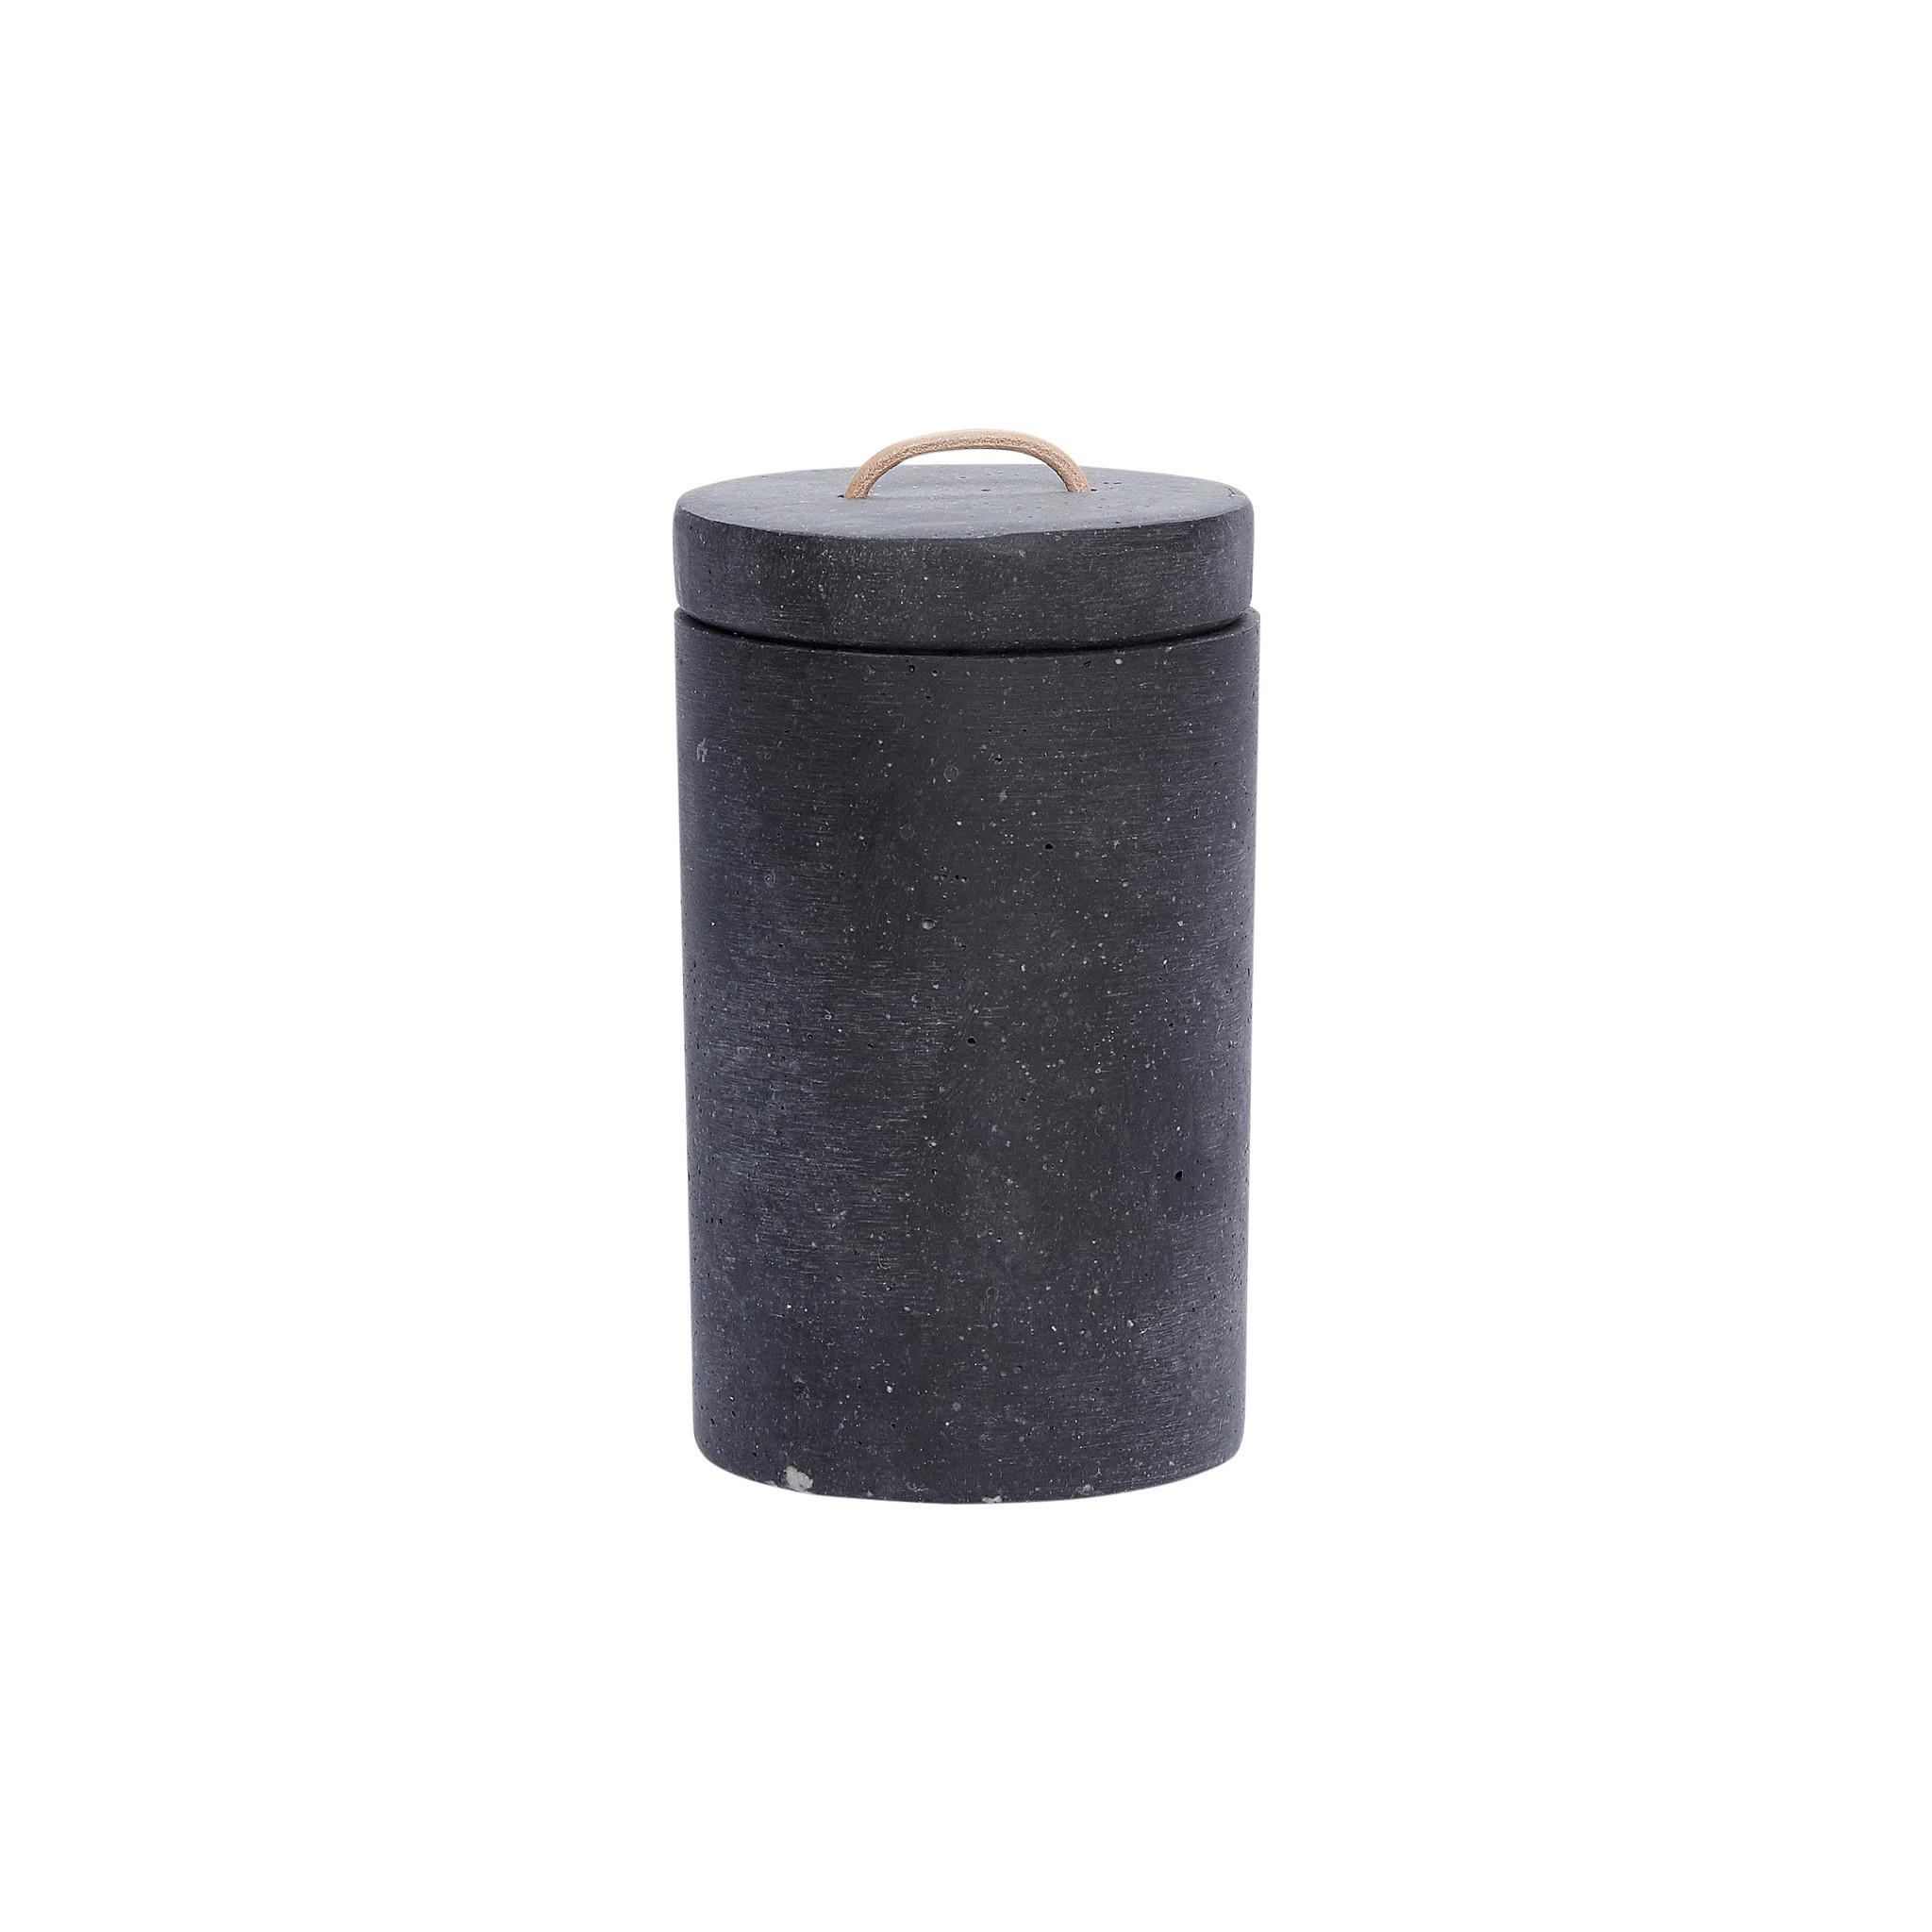 Hubsch Pot met deksel, zwart, klein